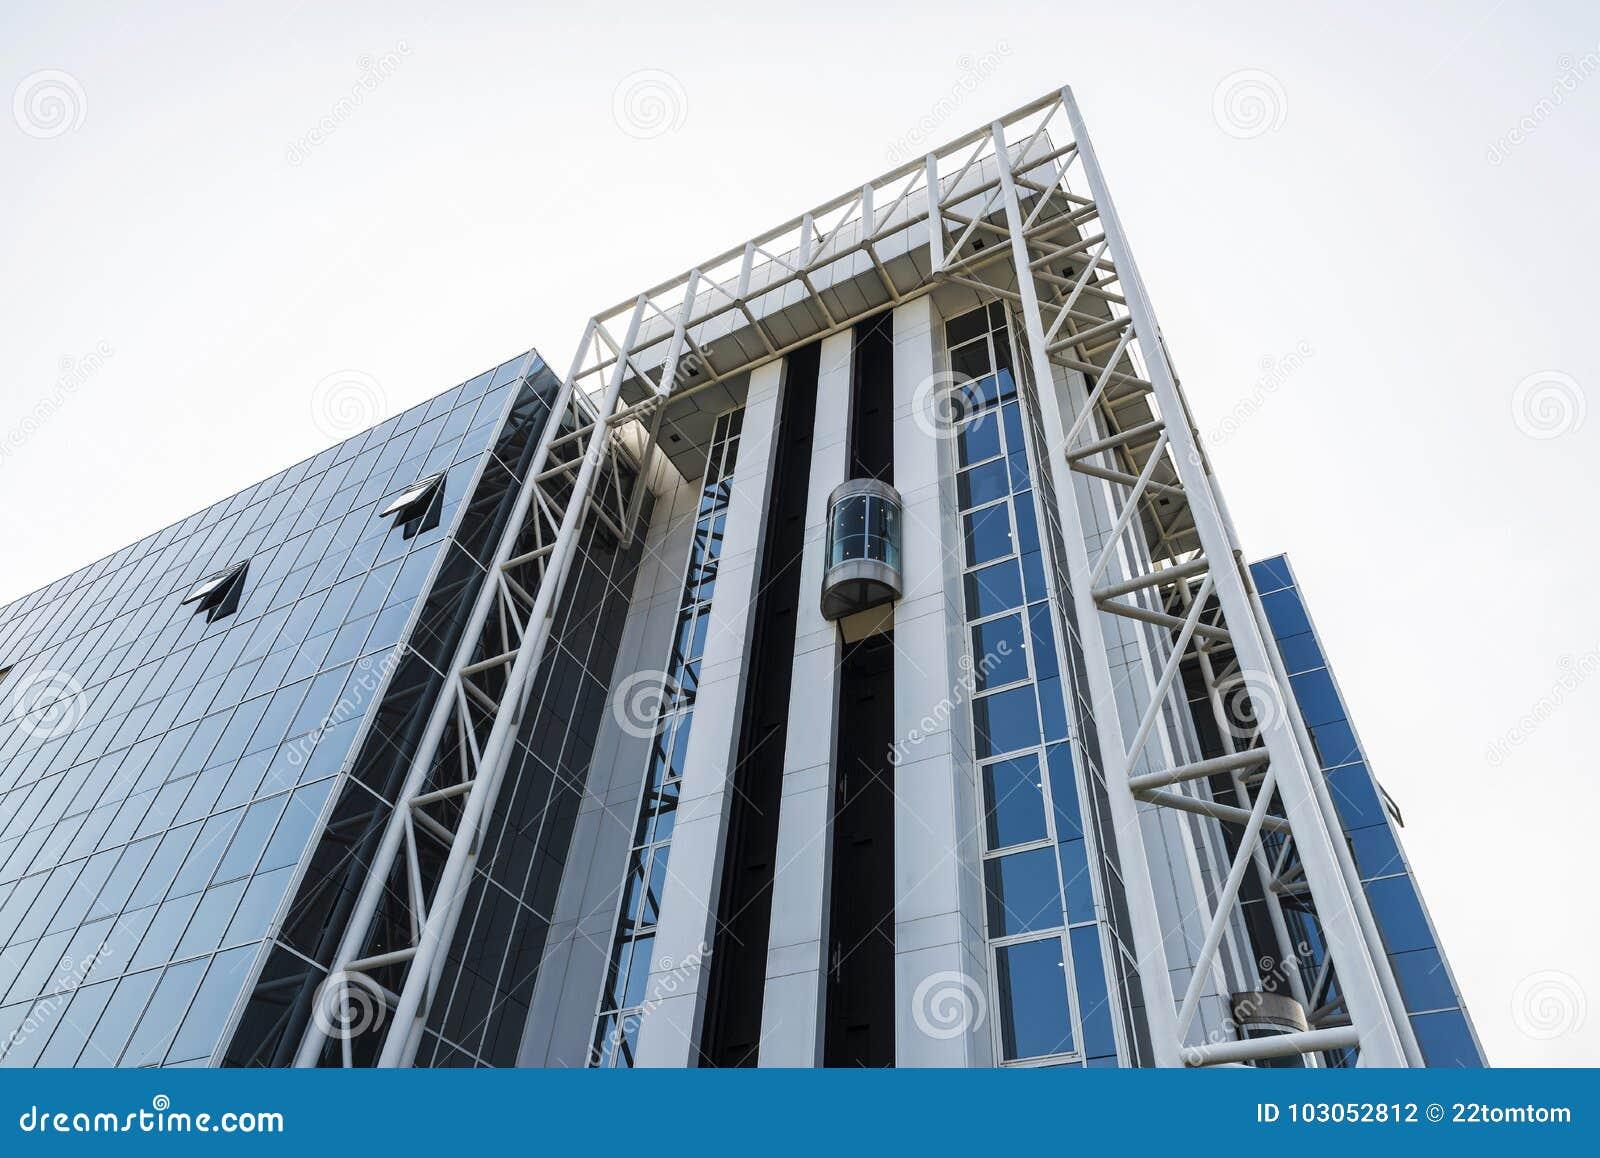 Peter street manchester immeuble de bureaux moderne situé en